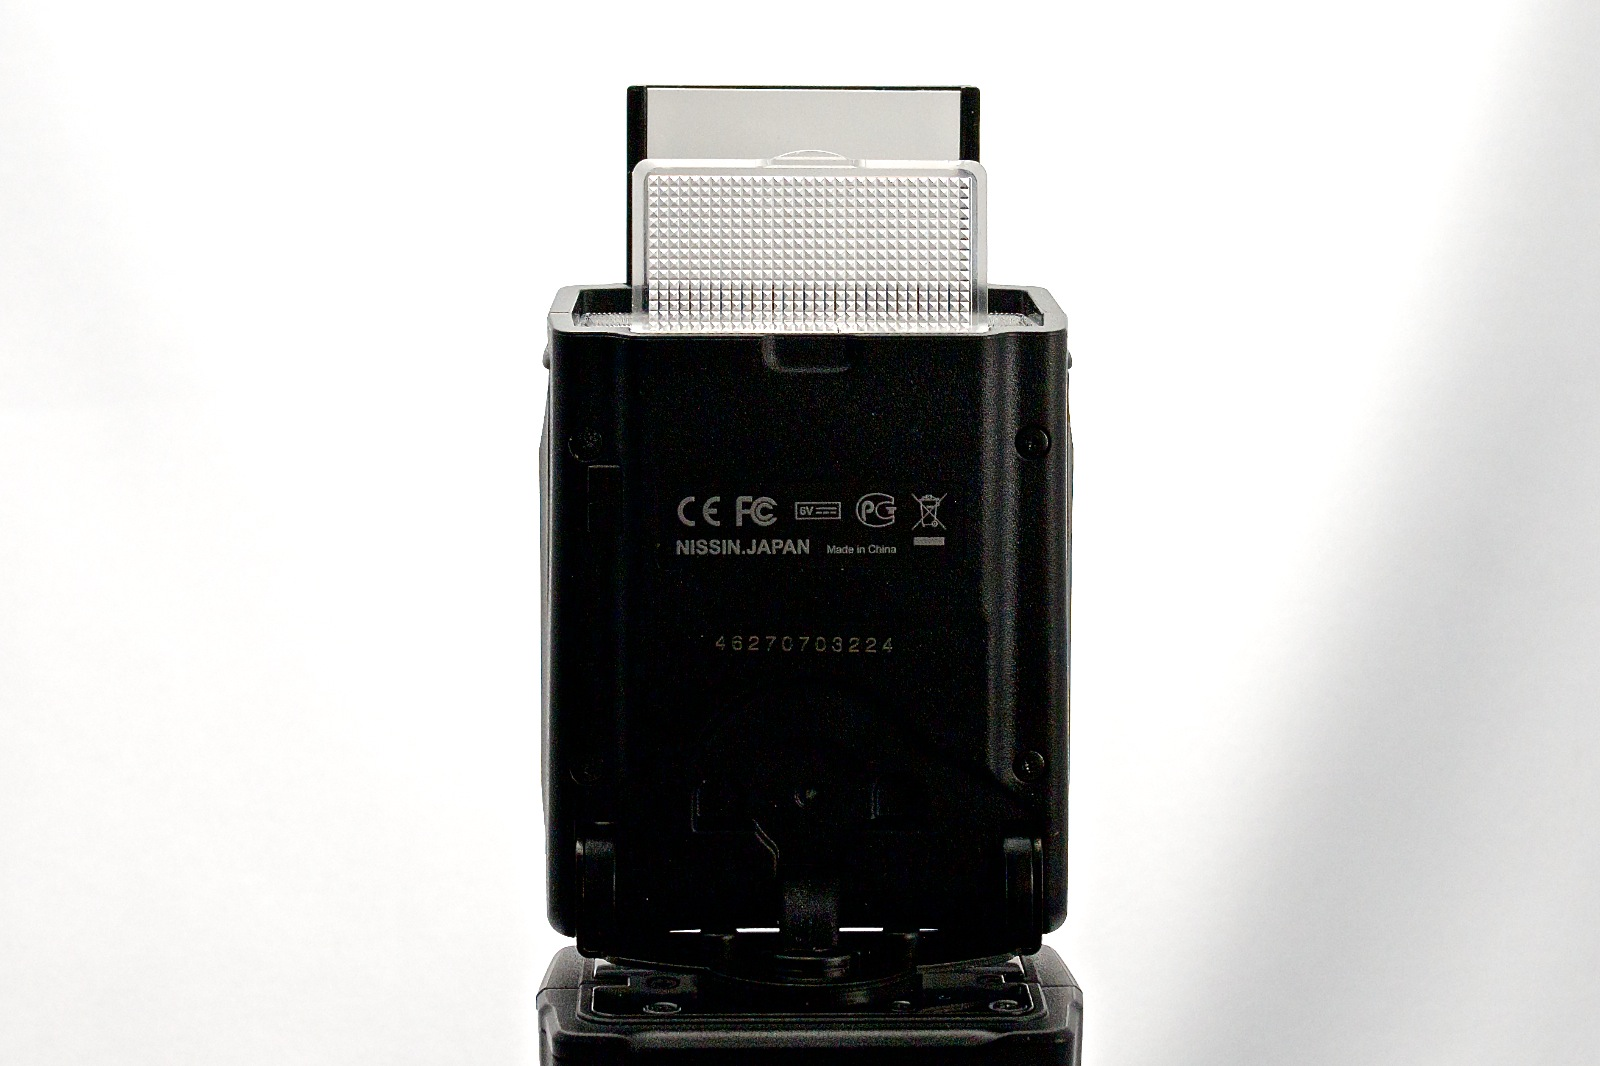 http://thedigitalstory.com/2014/09/30/i40-flash-diffuser.jpg